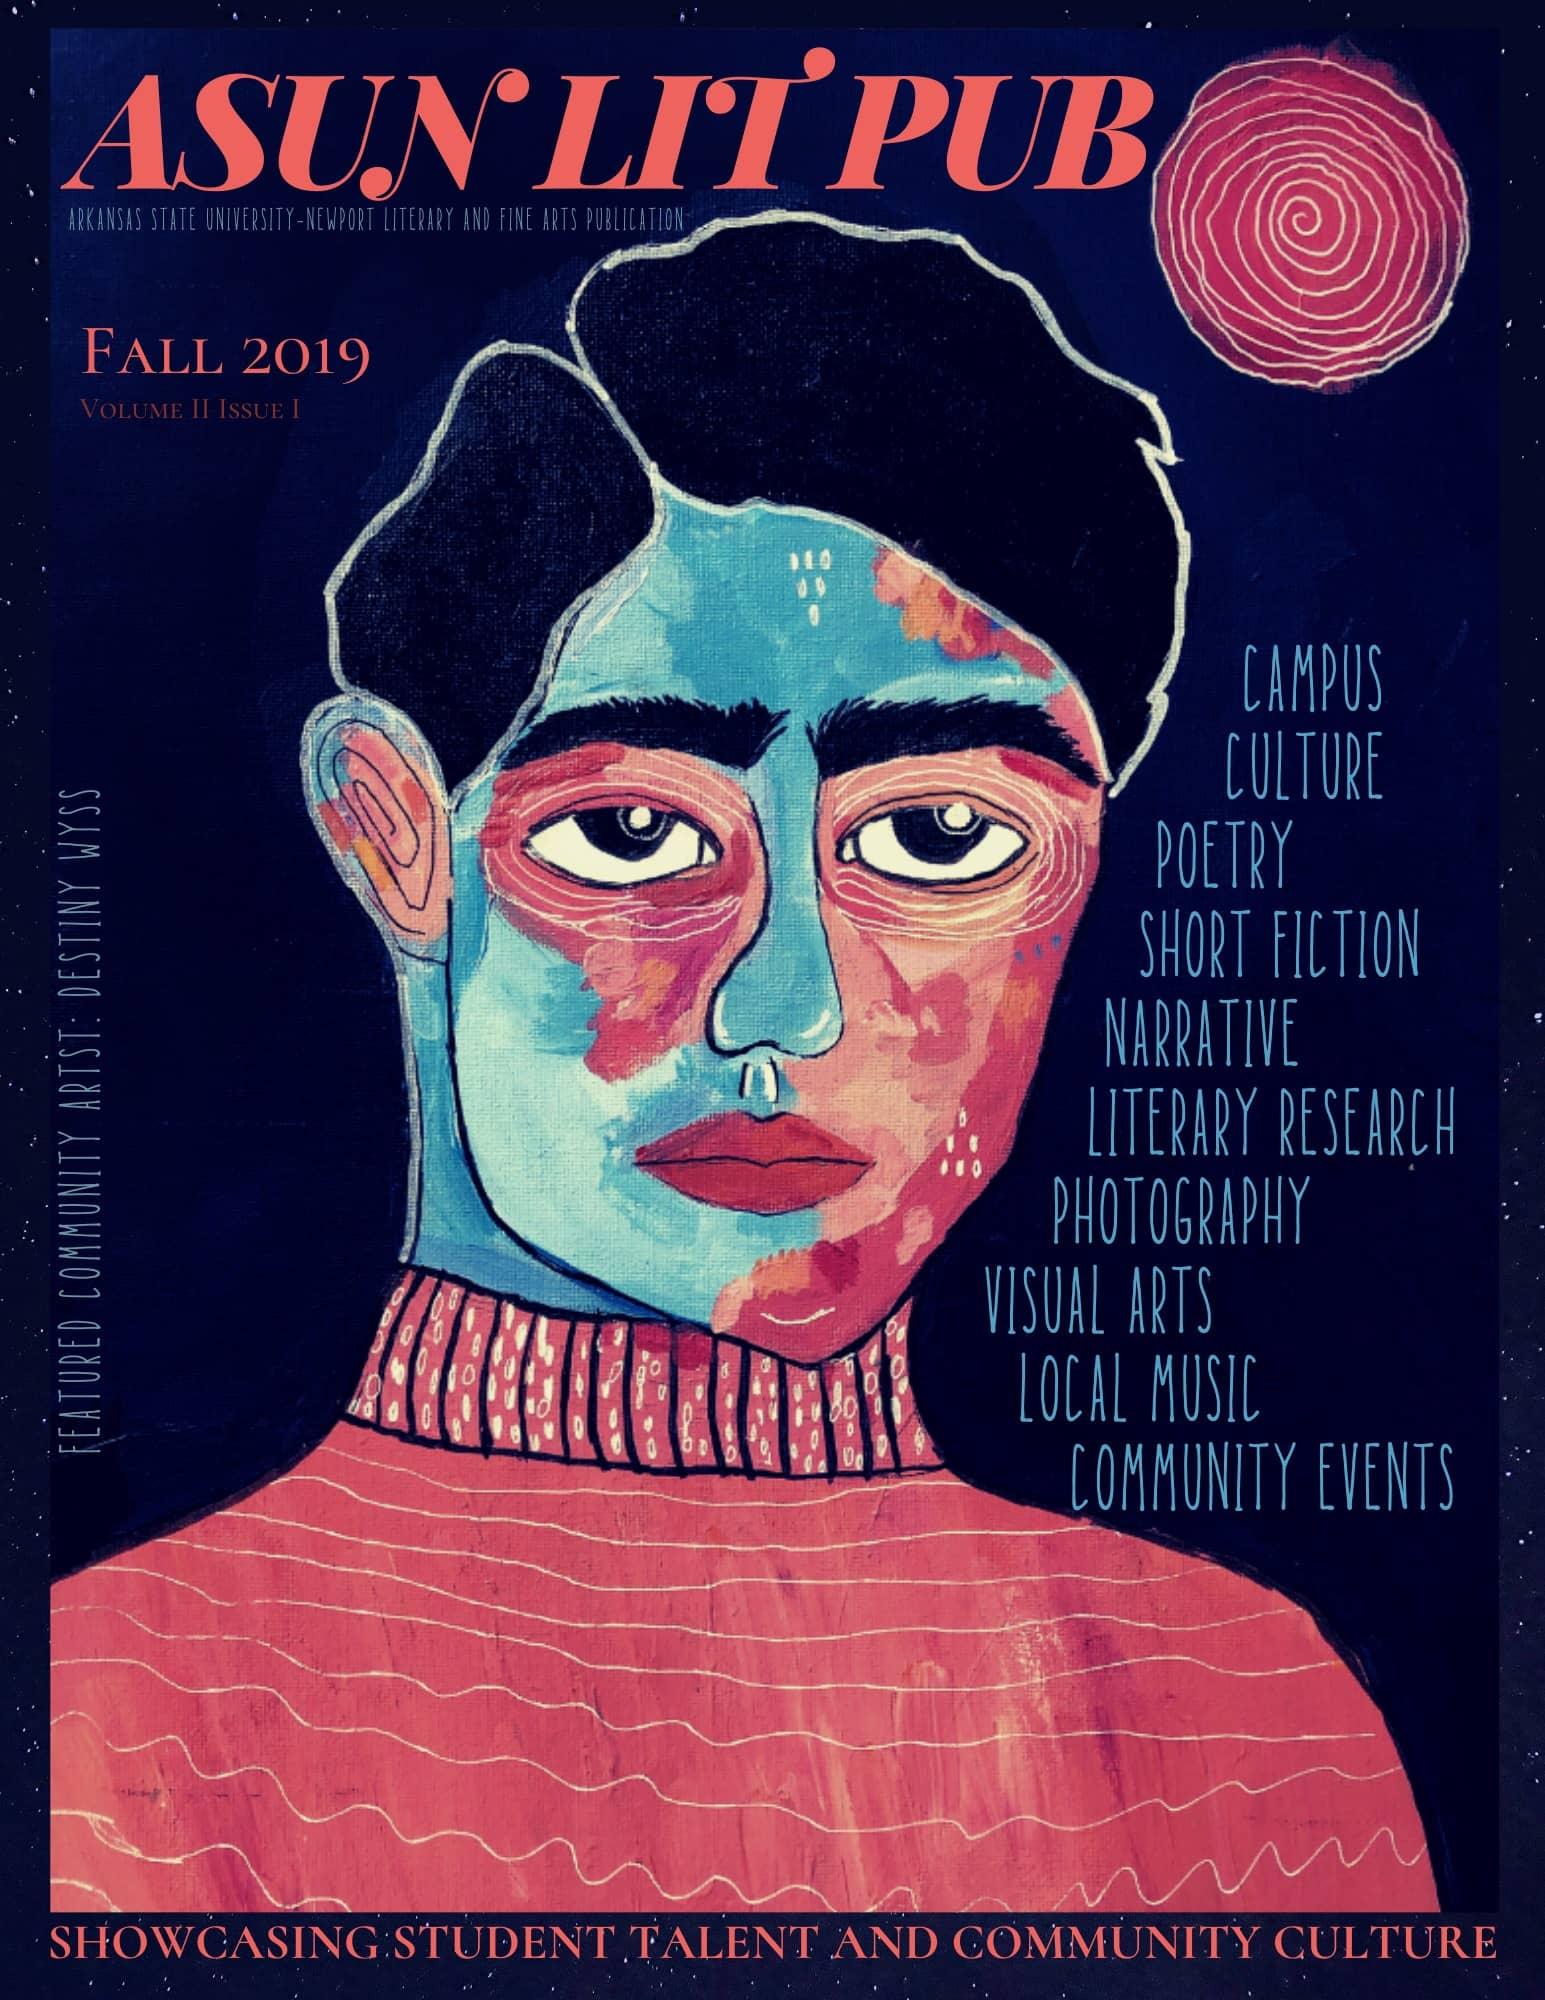 asunlitpub cover fall 2019